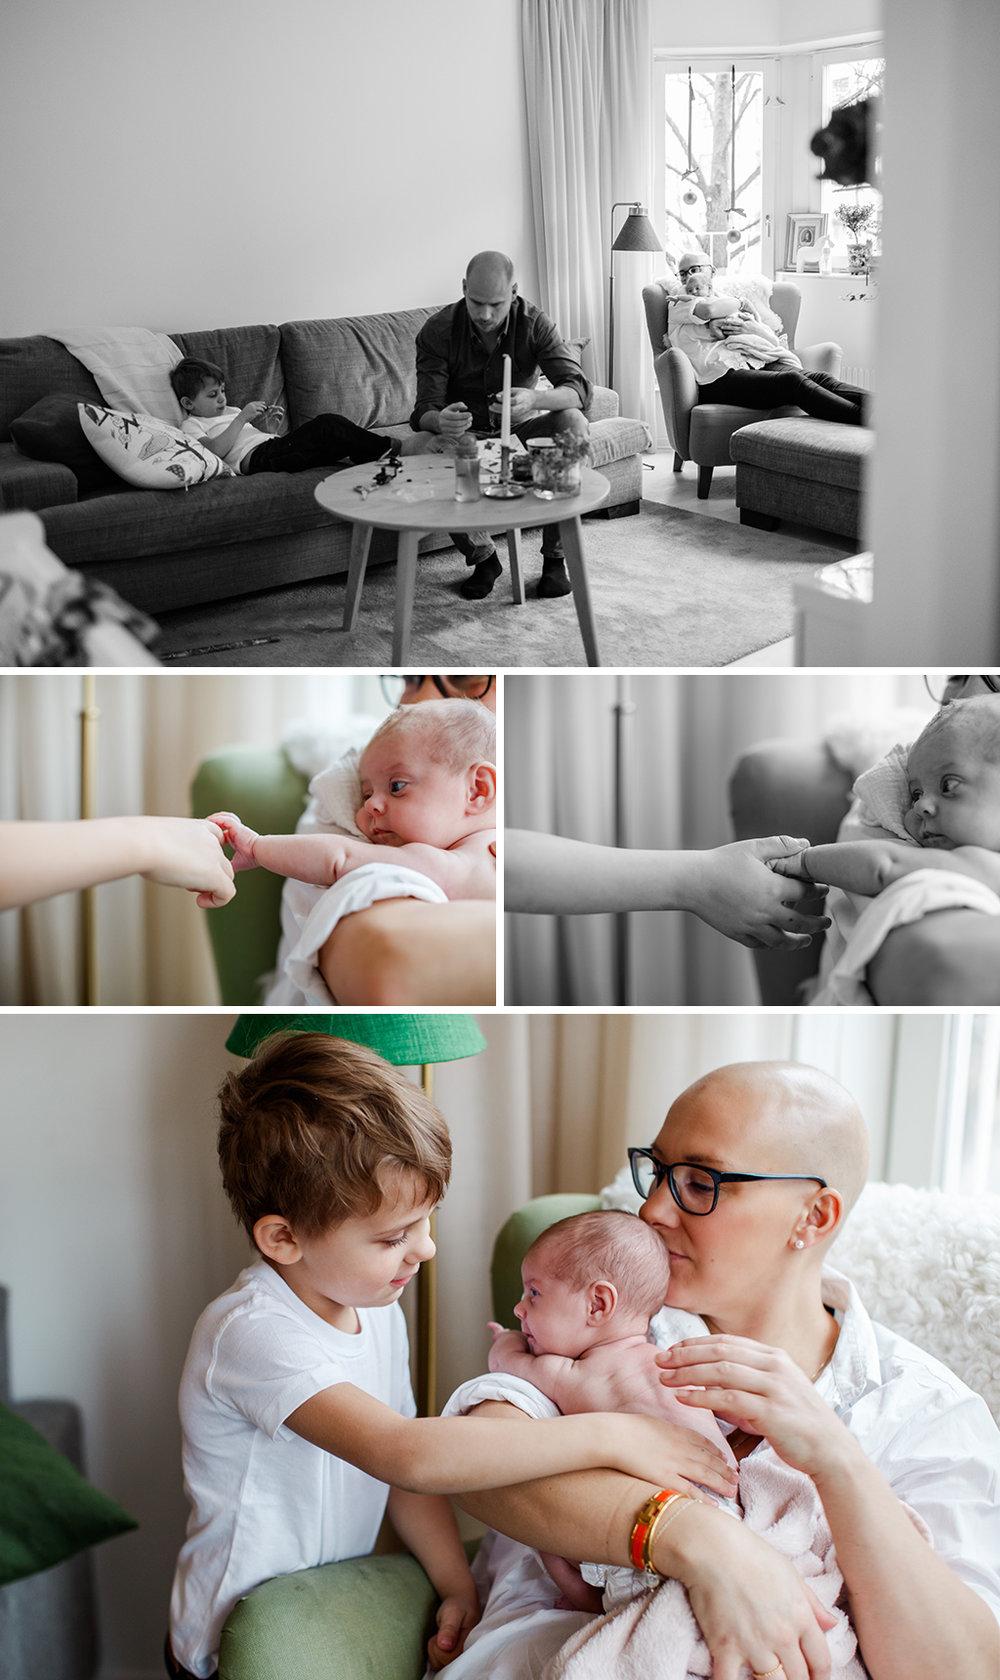 Lifestyle-nyfoddfotografering_newbornphotography_familjefotograf_Stockholm_6.jpg